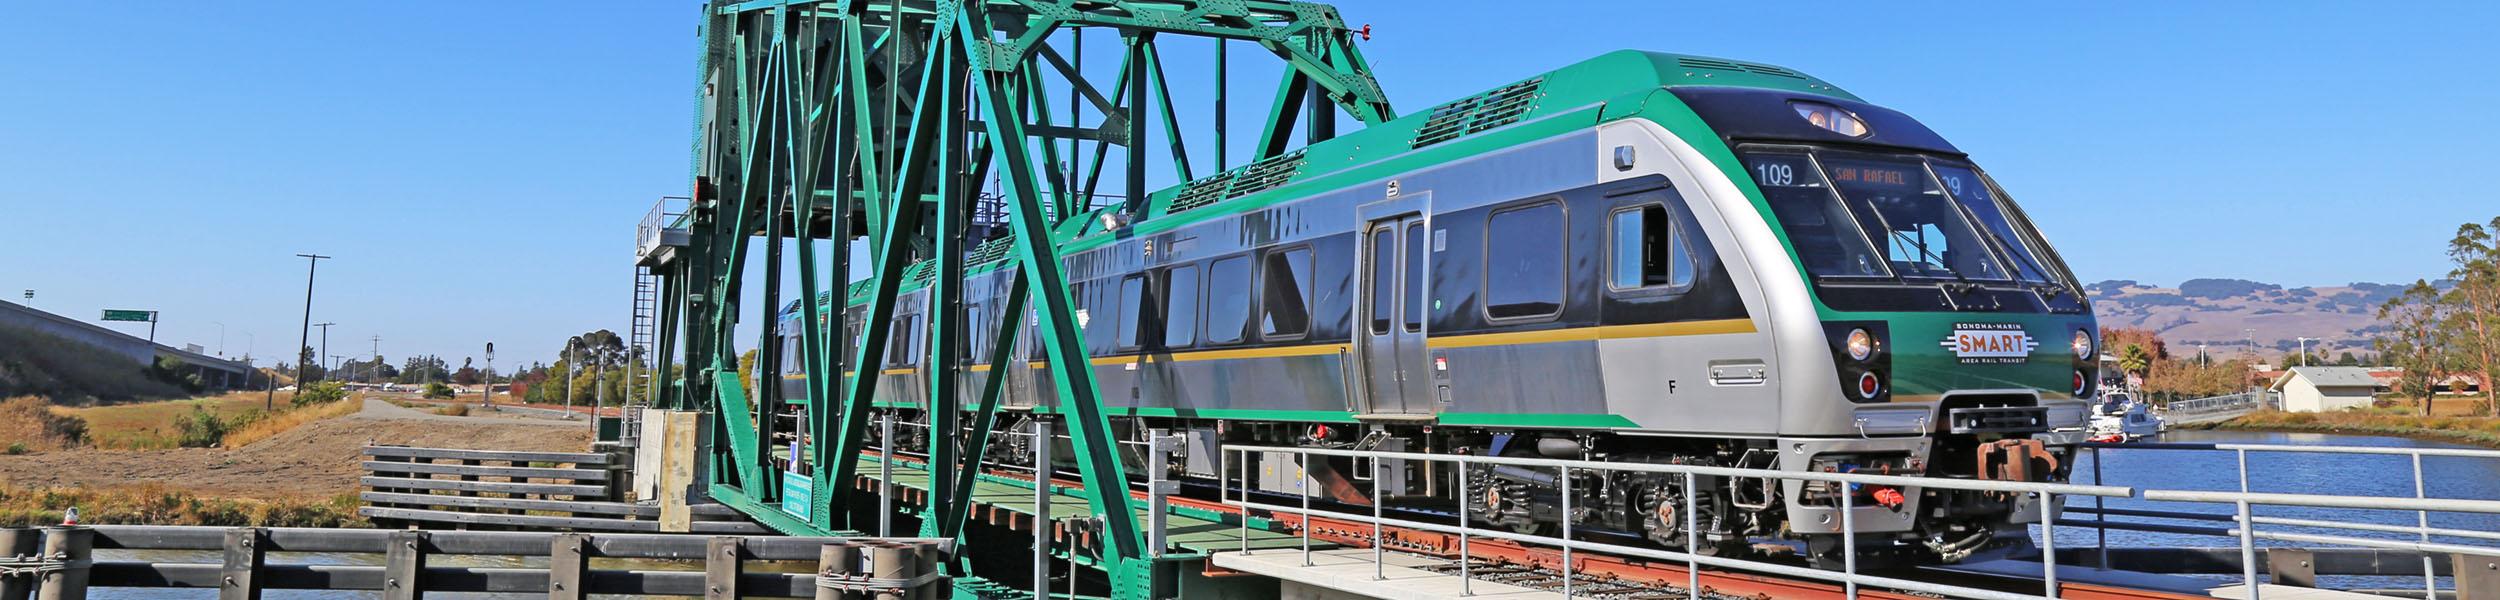 SMART Train crosses Haystack Bridge in Petaluma.